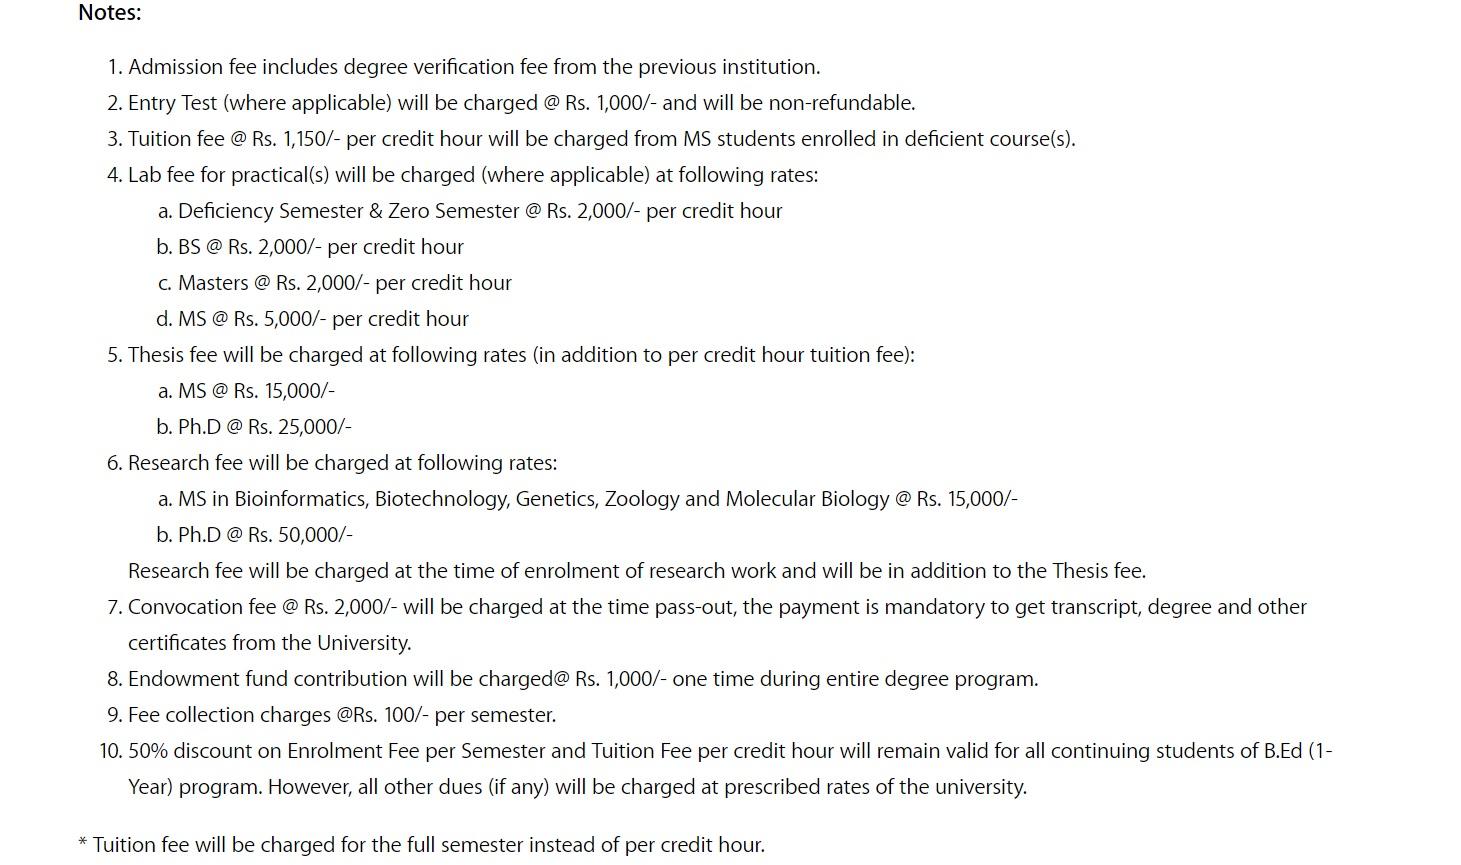 Virtual University of Pakistan Fee structure